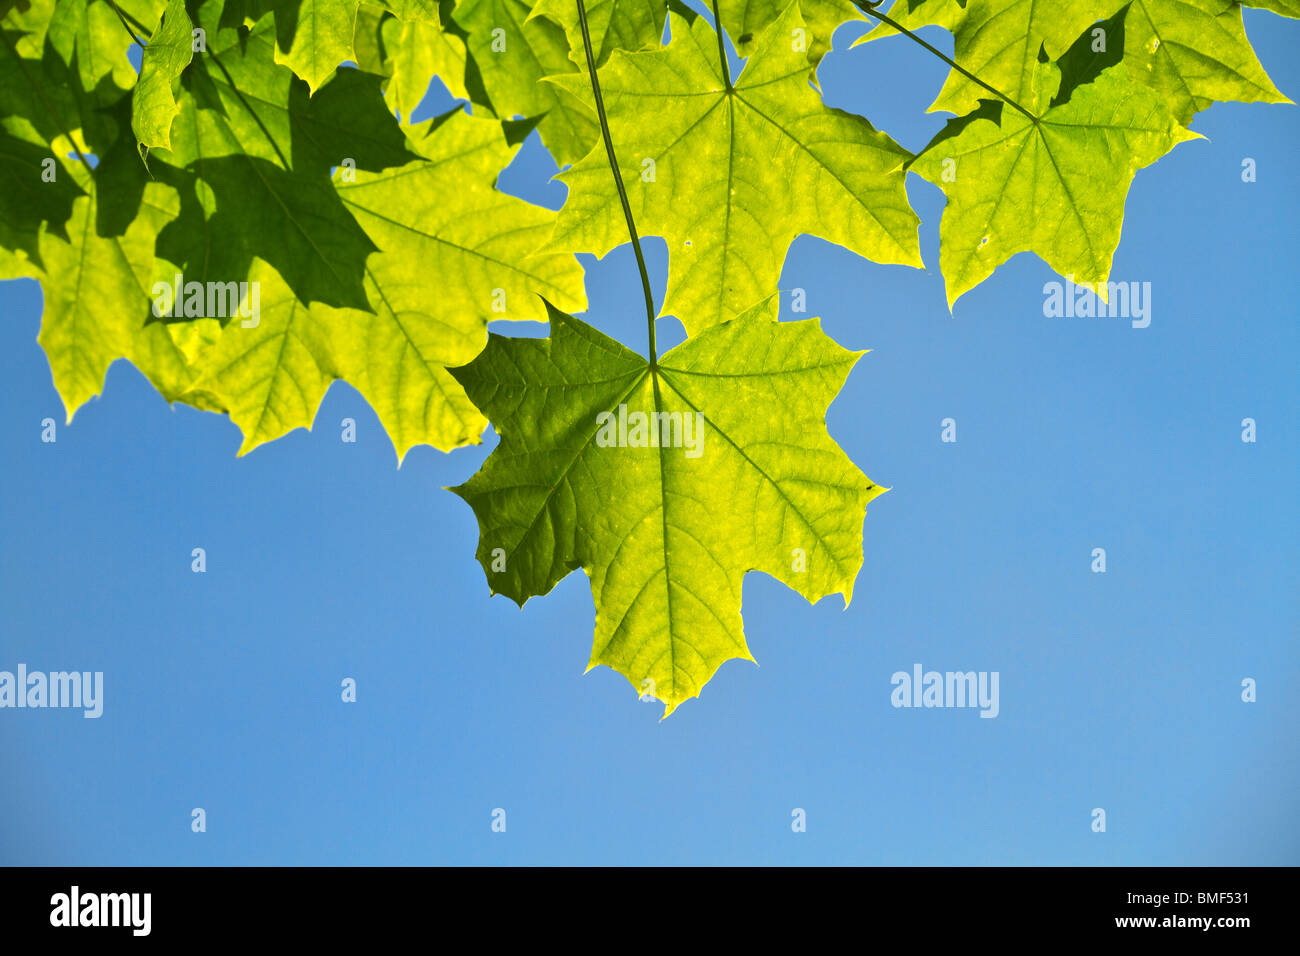 junge Ahorn-Blätter, Hintergrundbeleuchtung Stockbild